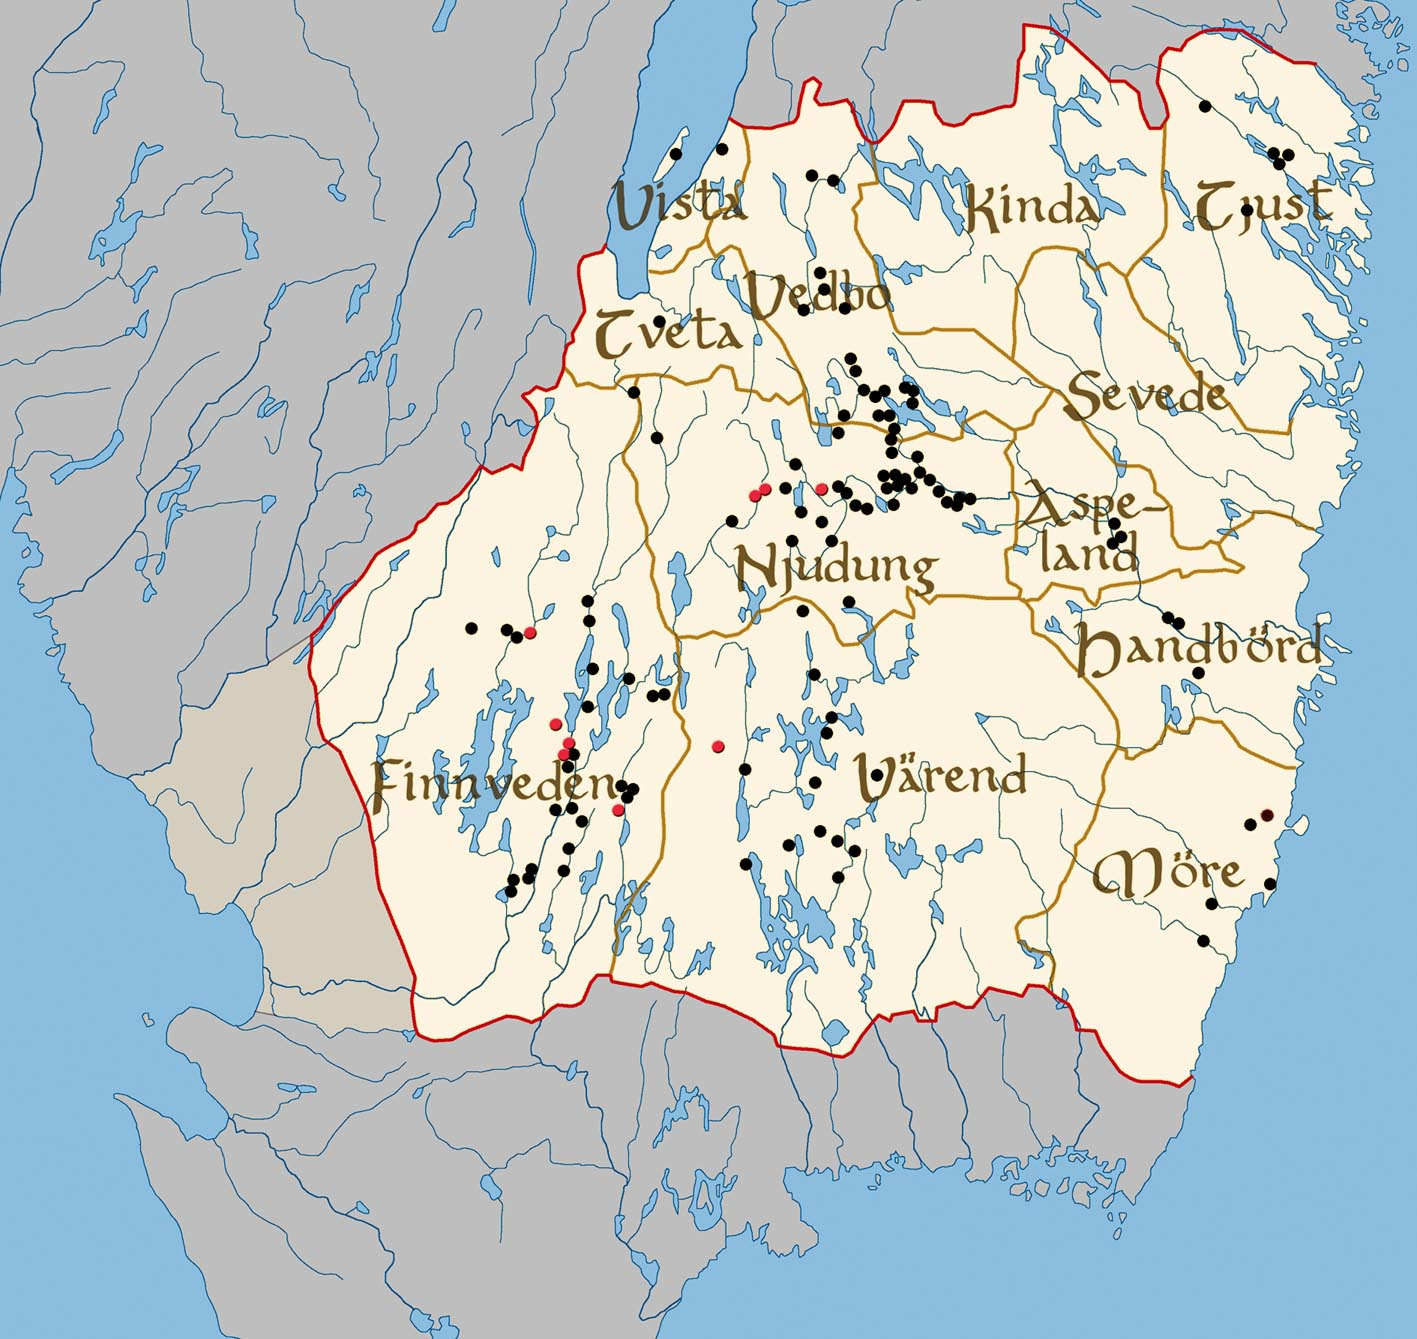 FileMap Of Landscape Smaland Swedenjpg Wikimedia Commons - Sweden map jpg